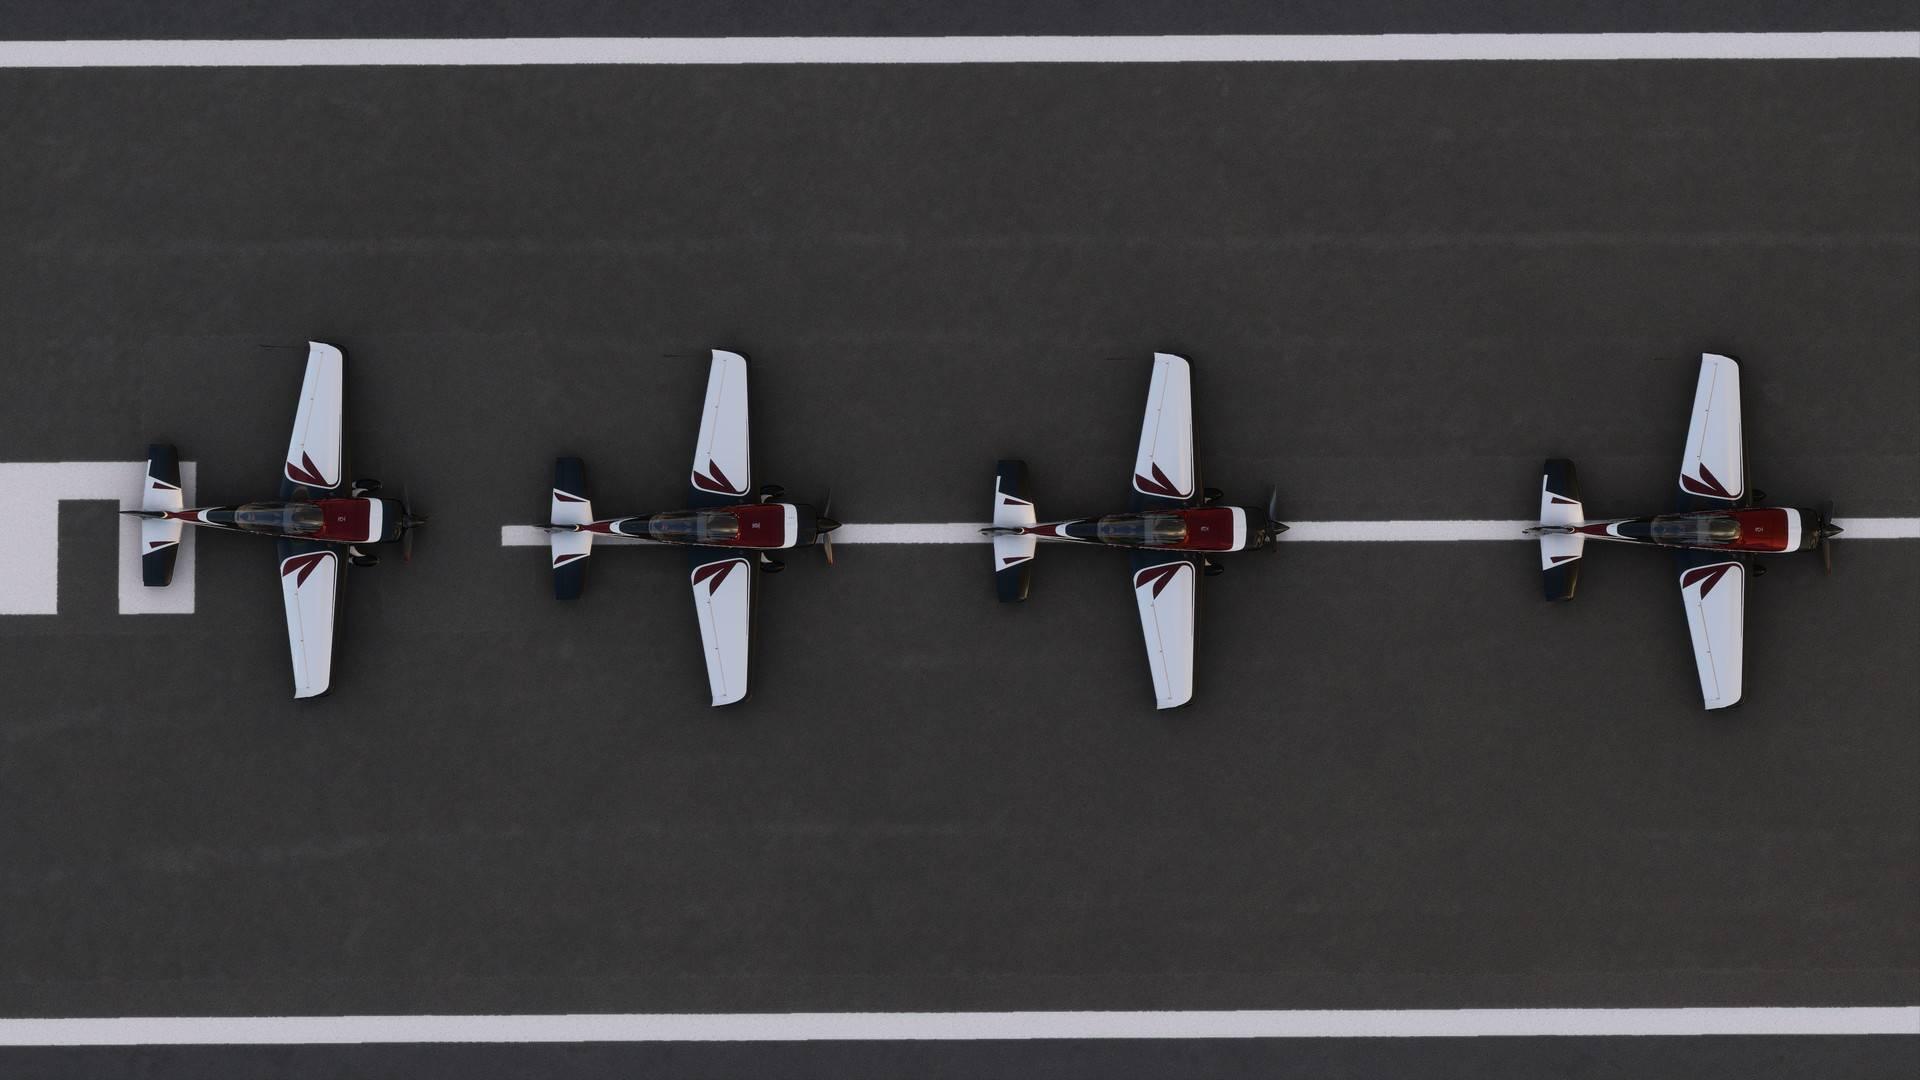 Microsoft Flight Simulator immagini anteprima